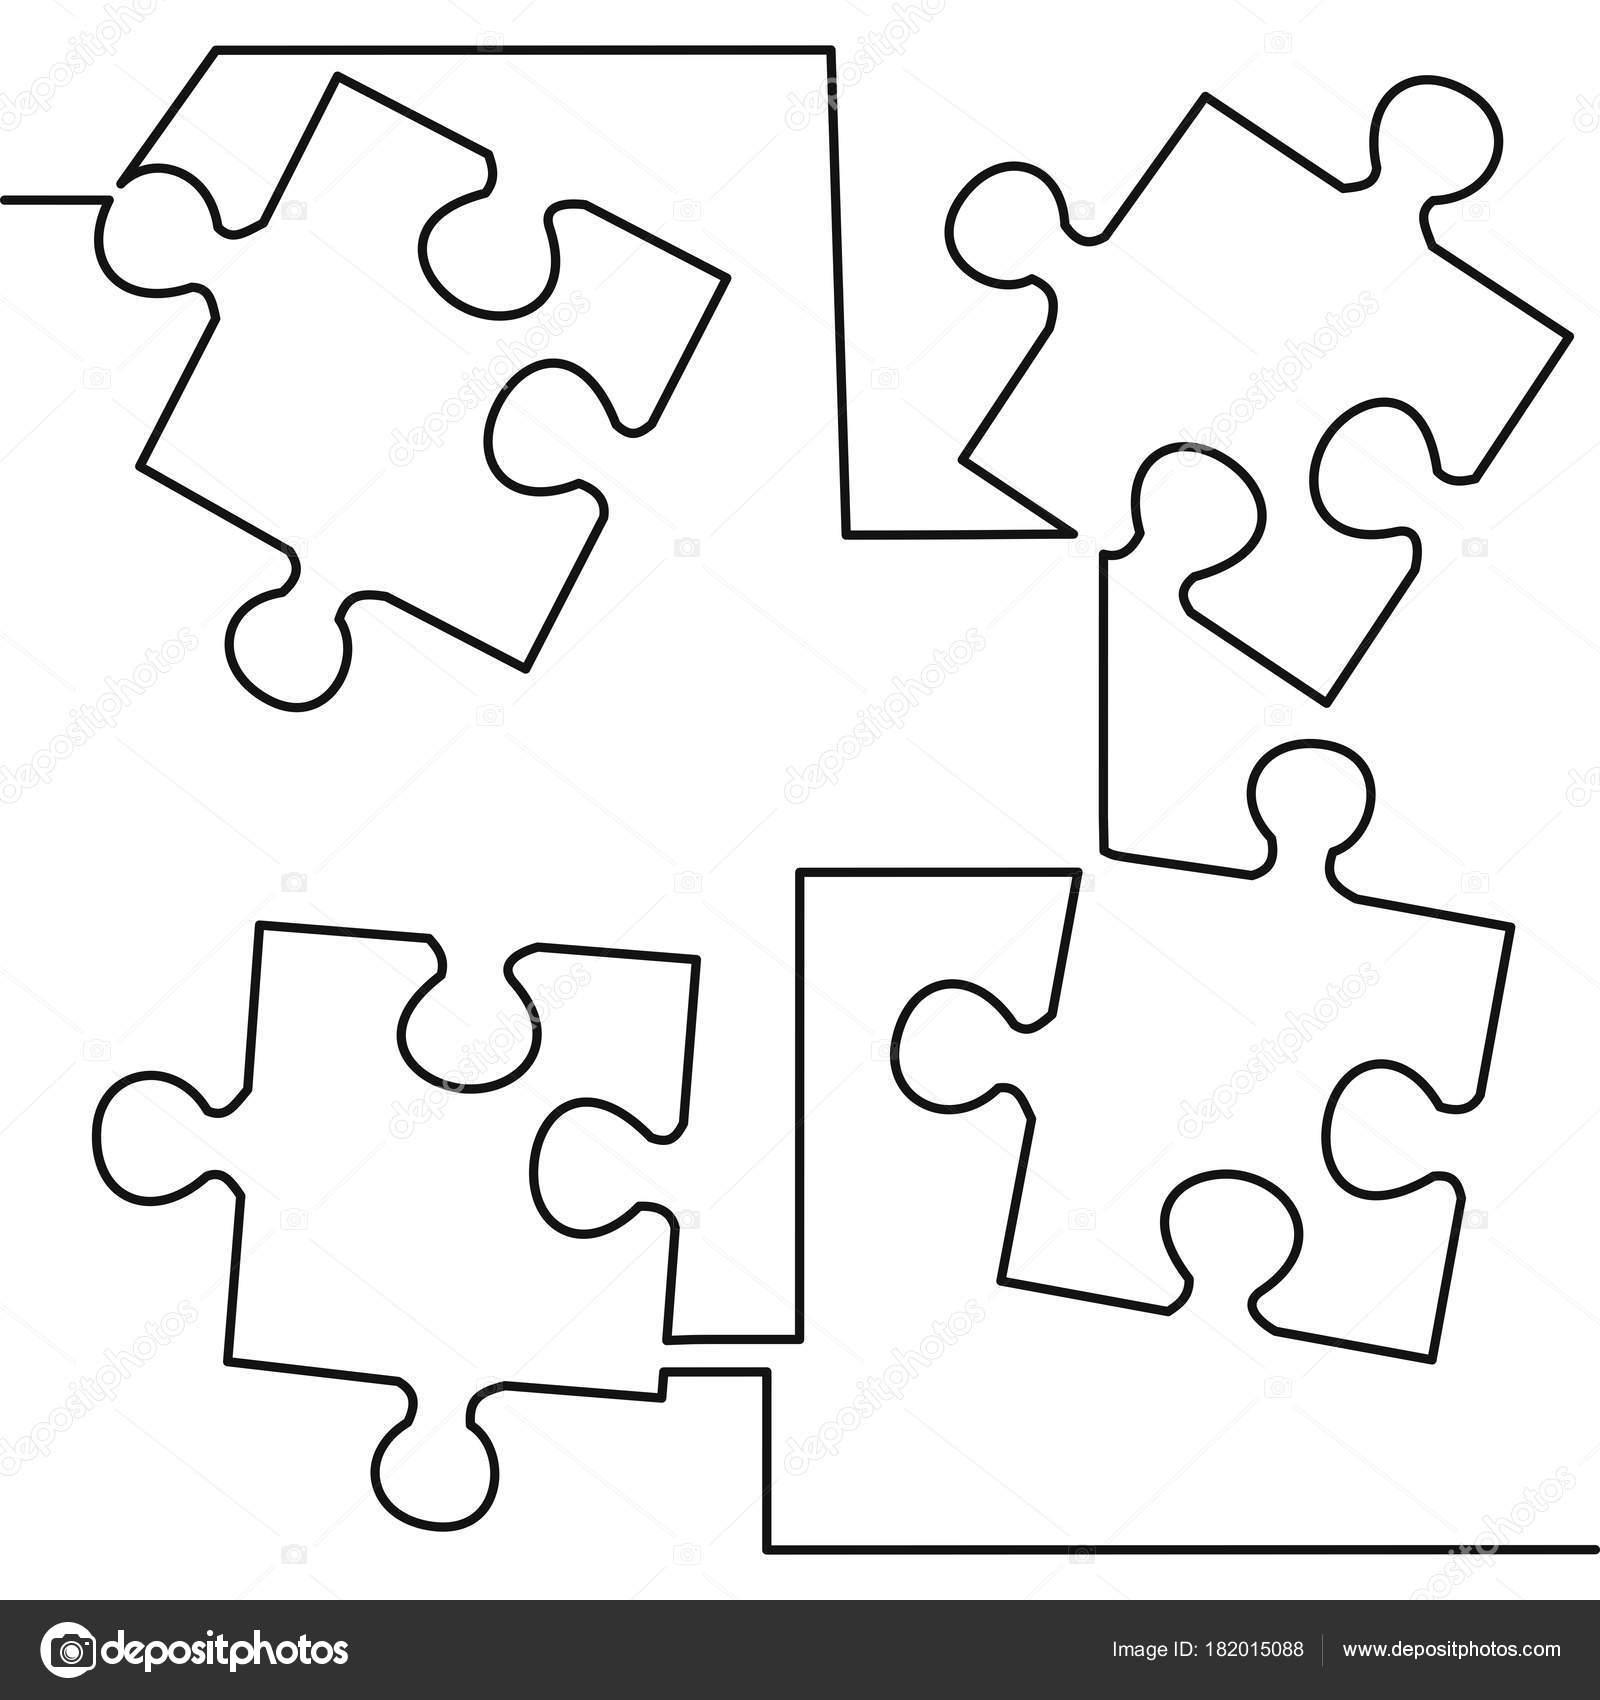 Line Drawing Crossword Clue : Continua un dibujo de línea rompecabezas — vector